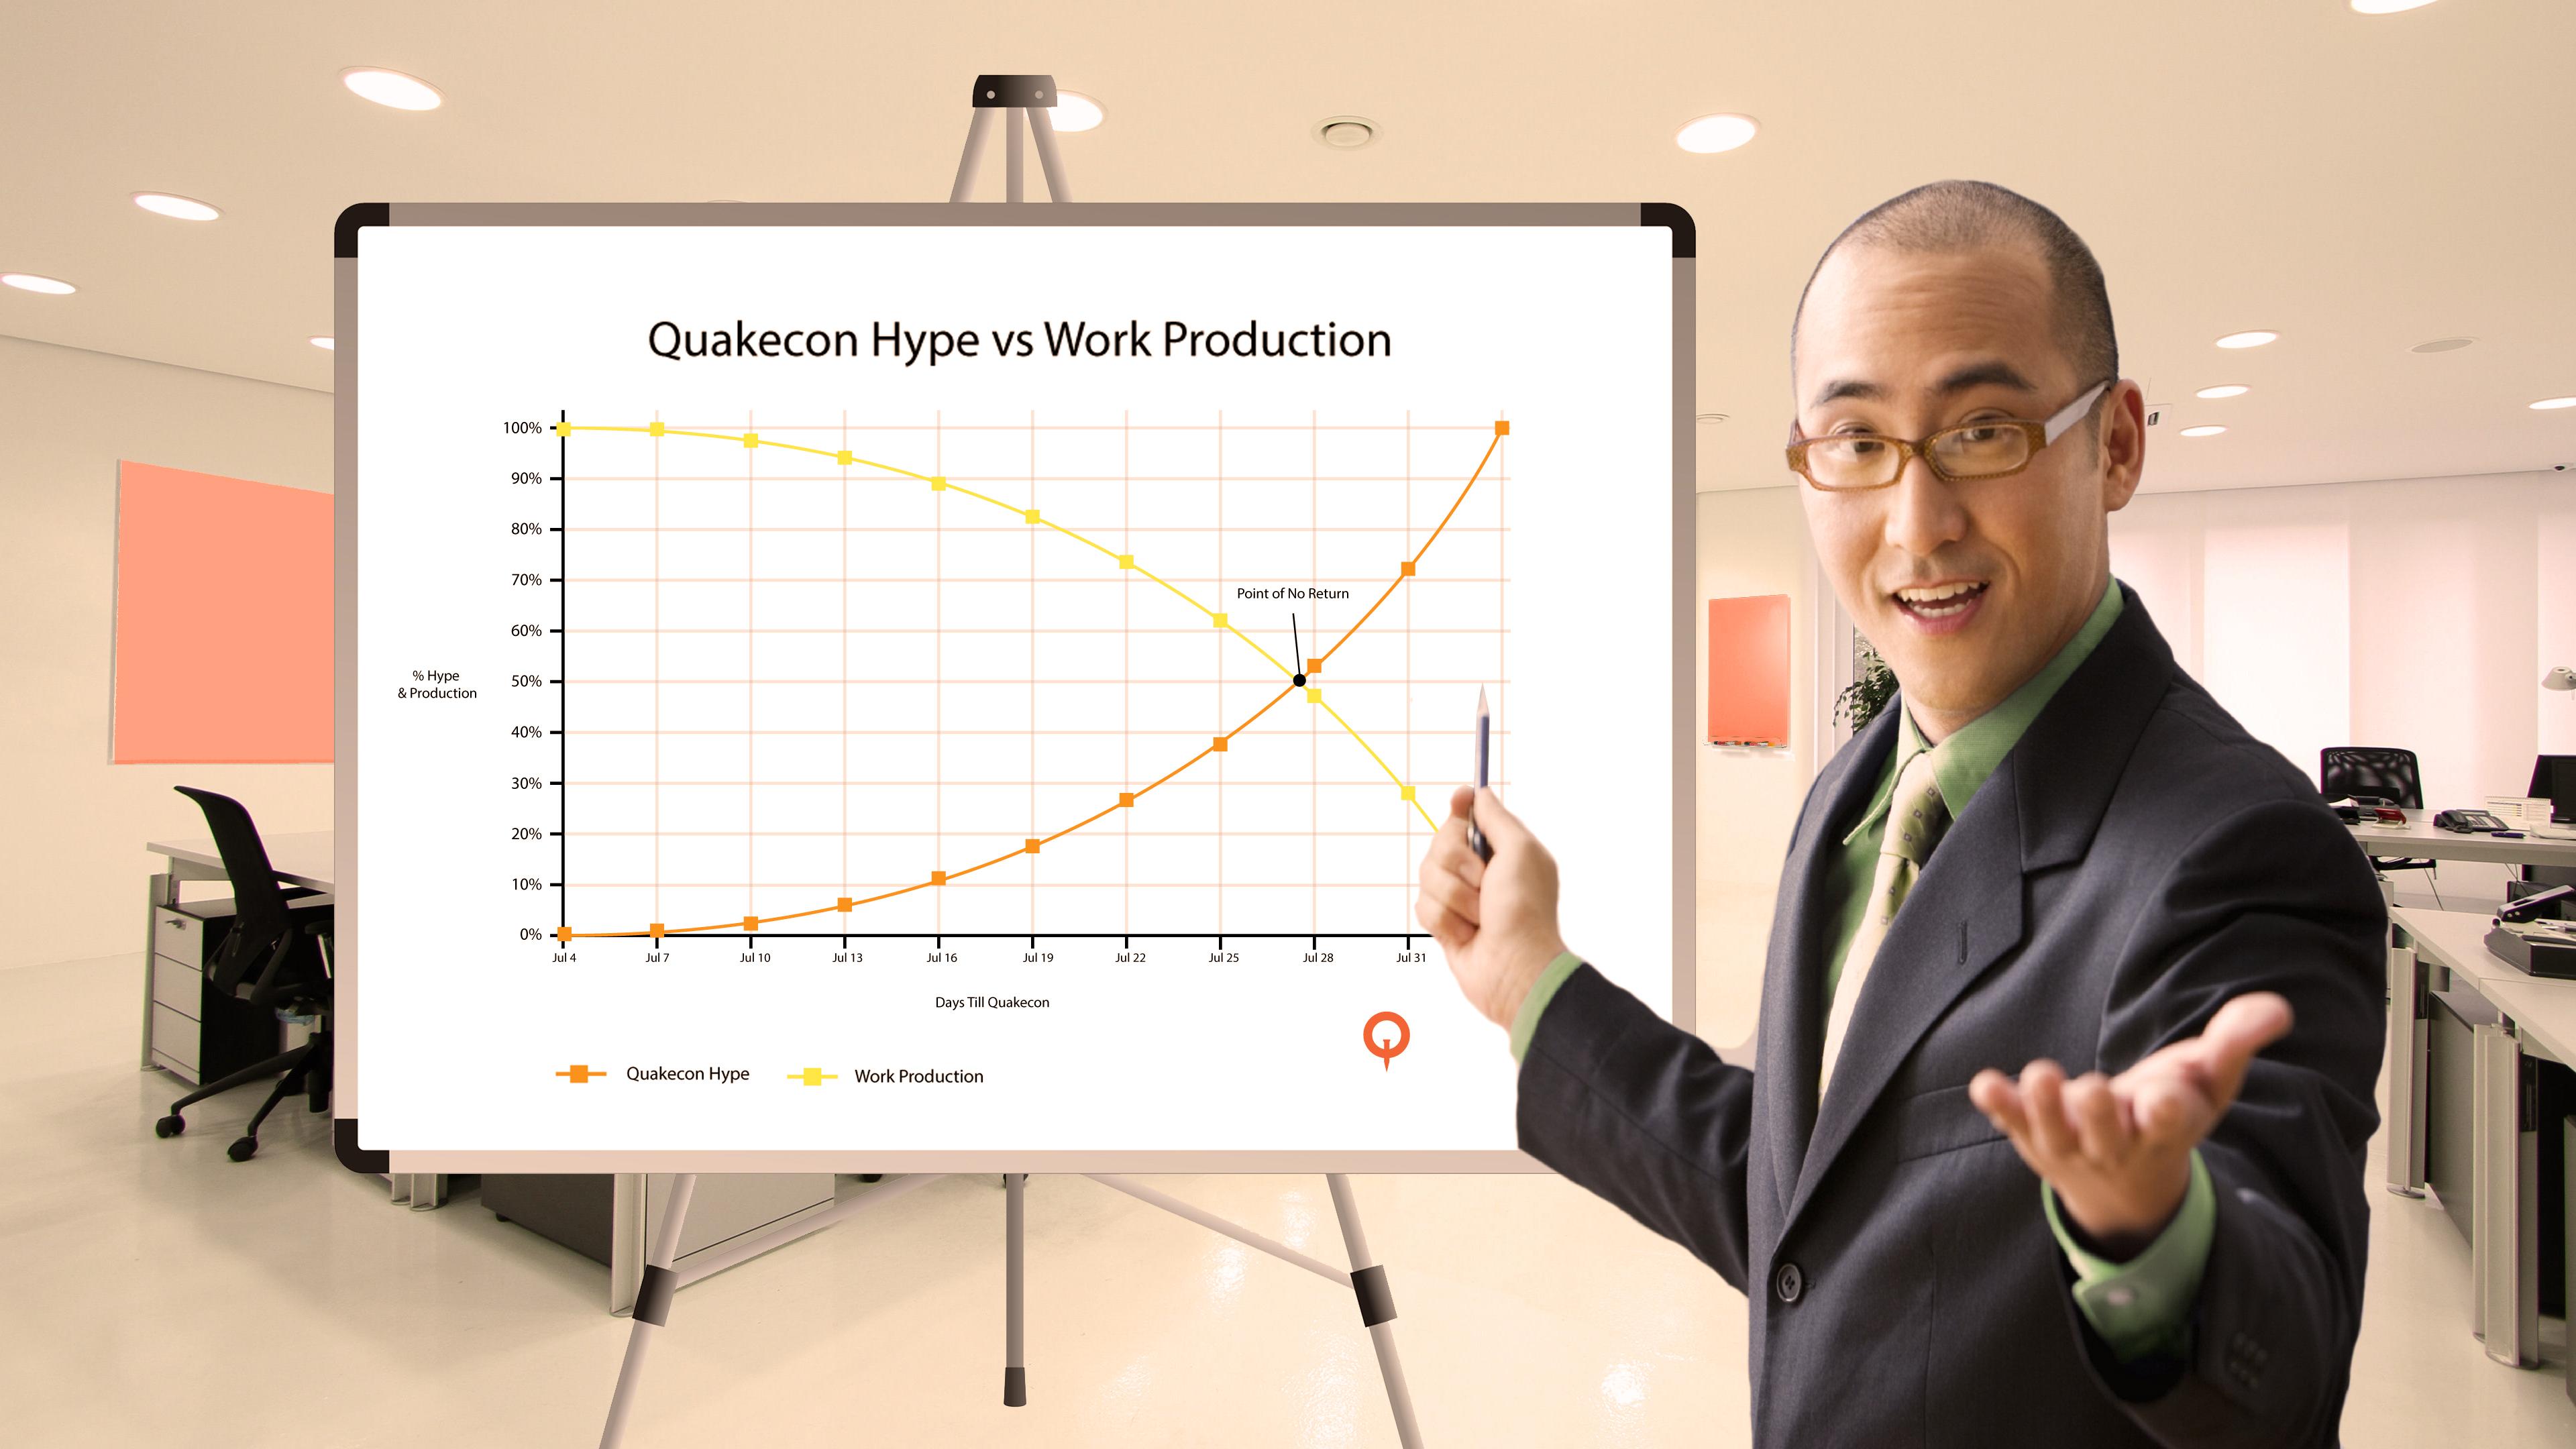 Quakecon Hype2